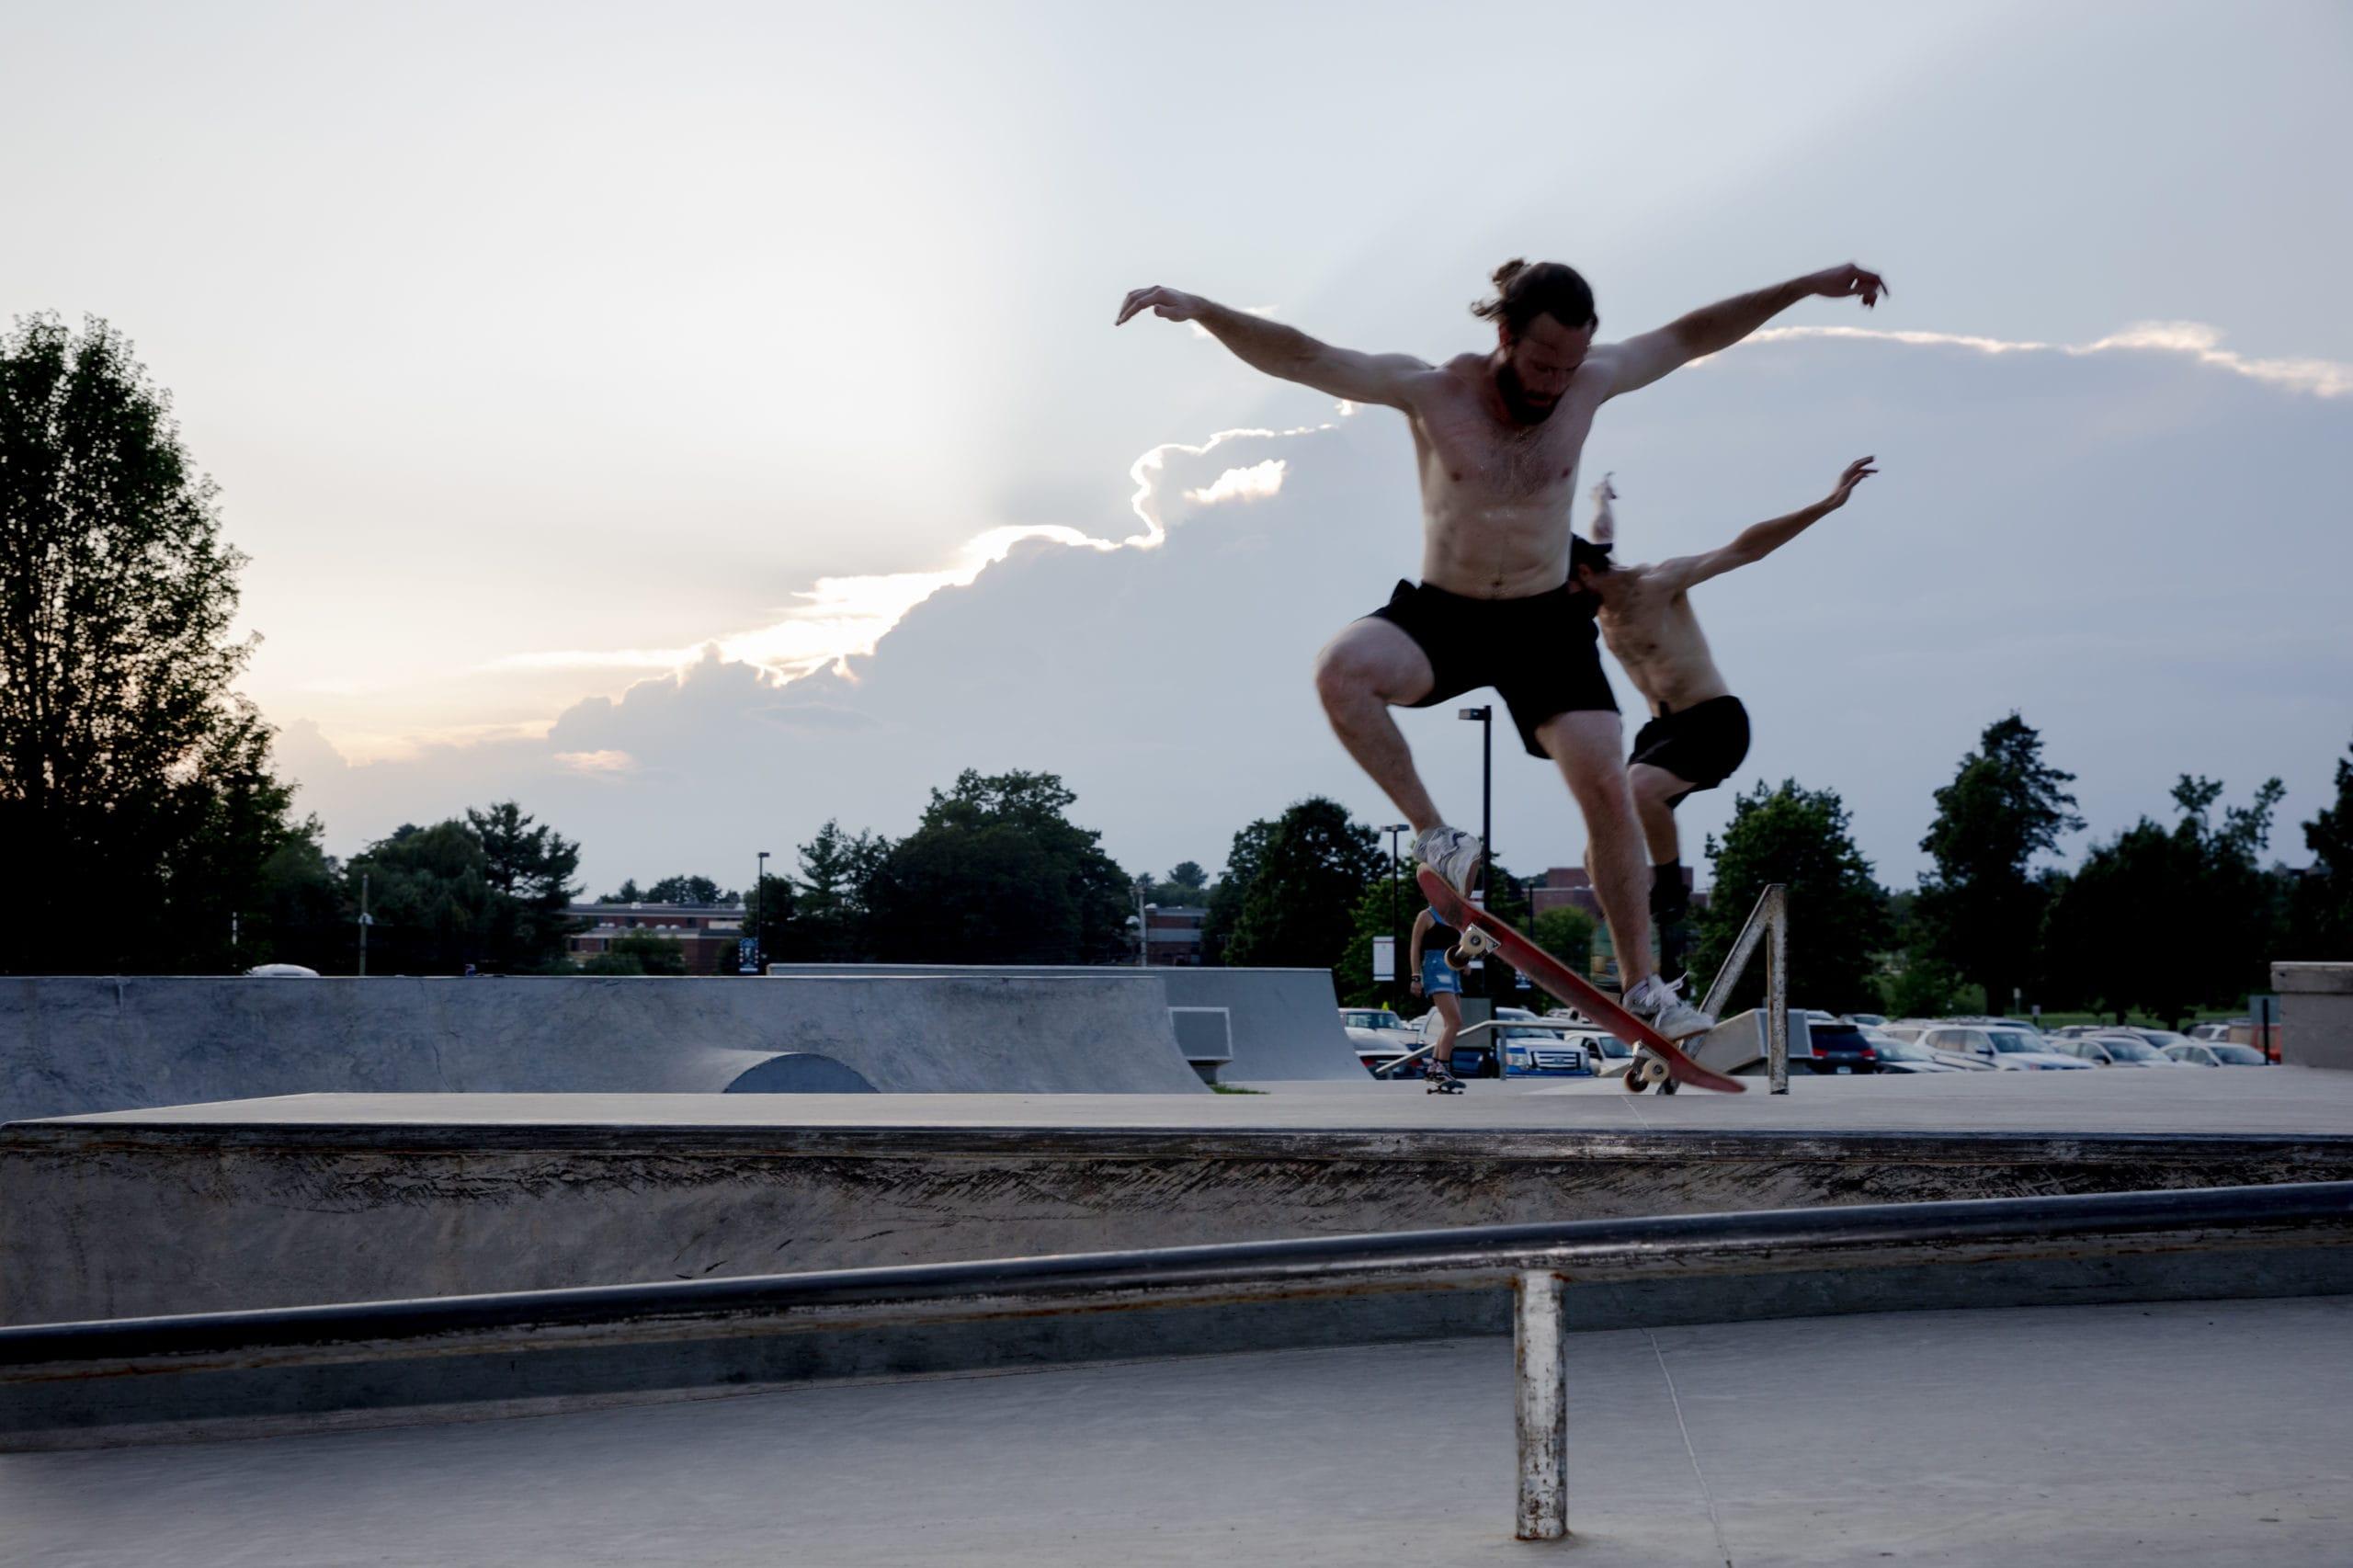 Photos: Skateboarding in the summer heat